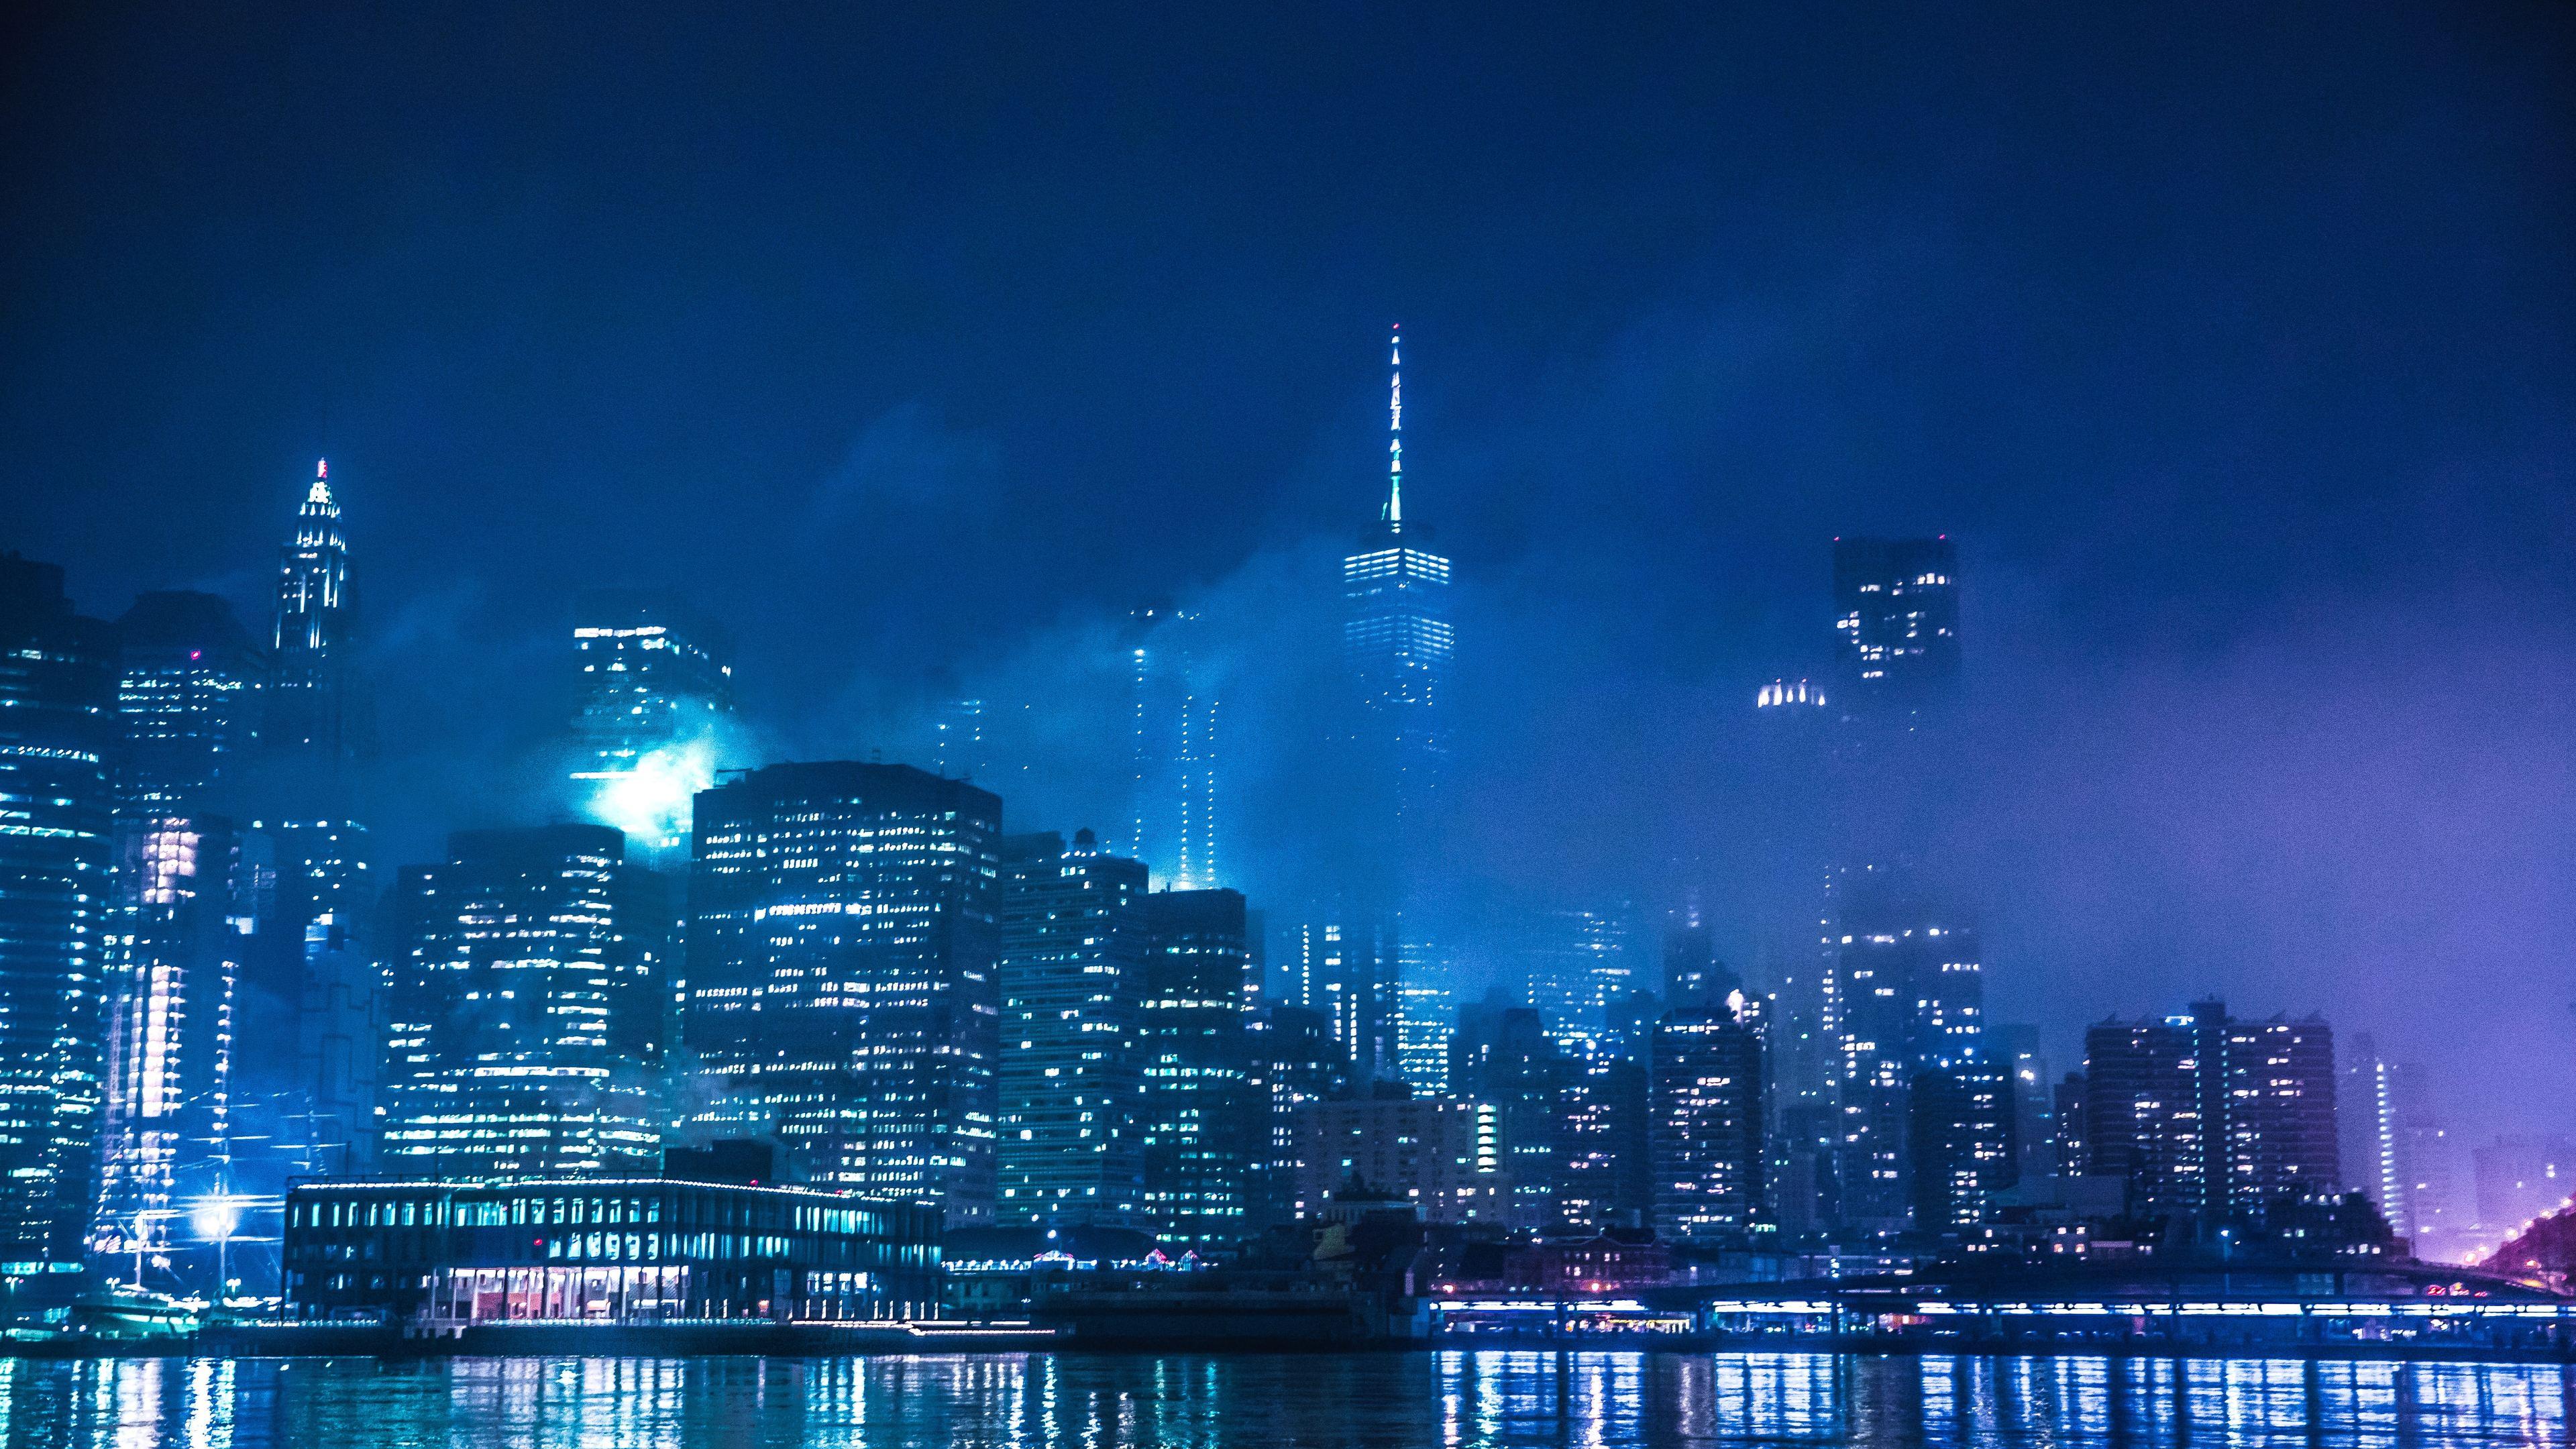 the lights of new york 1569187793 - The Lights Of New York - world wallpapers, new york wallpapers, hd-wallpapers, city wallpapers, 5k wallpapers, 4k-wallpapers